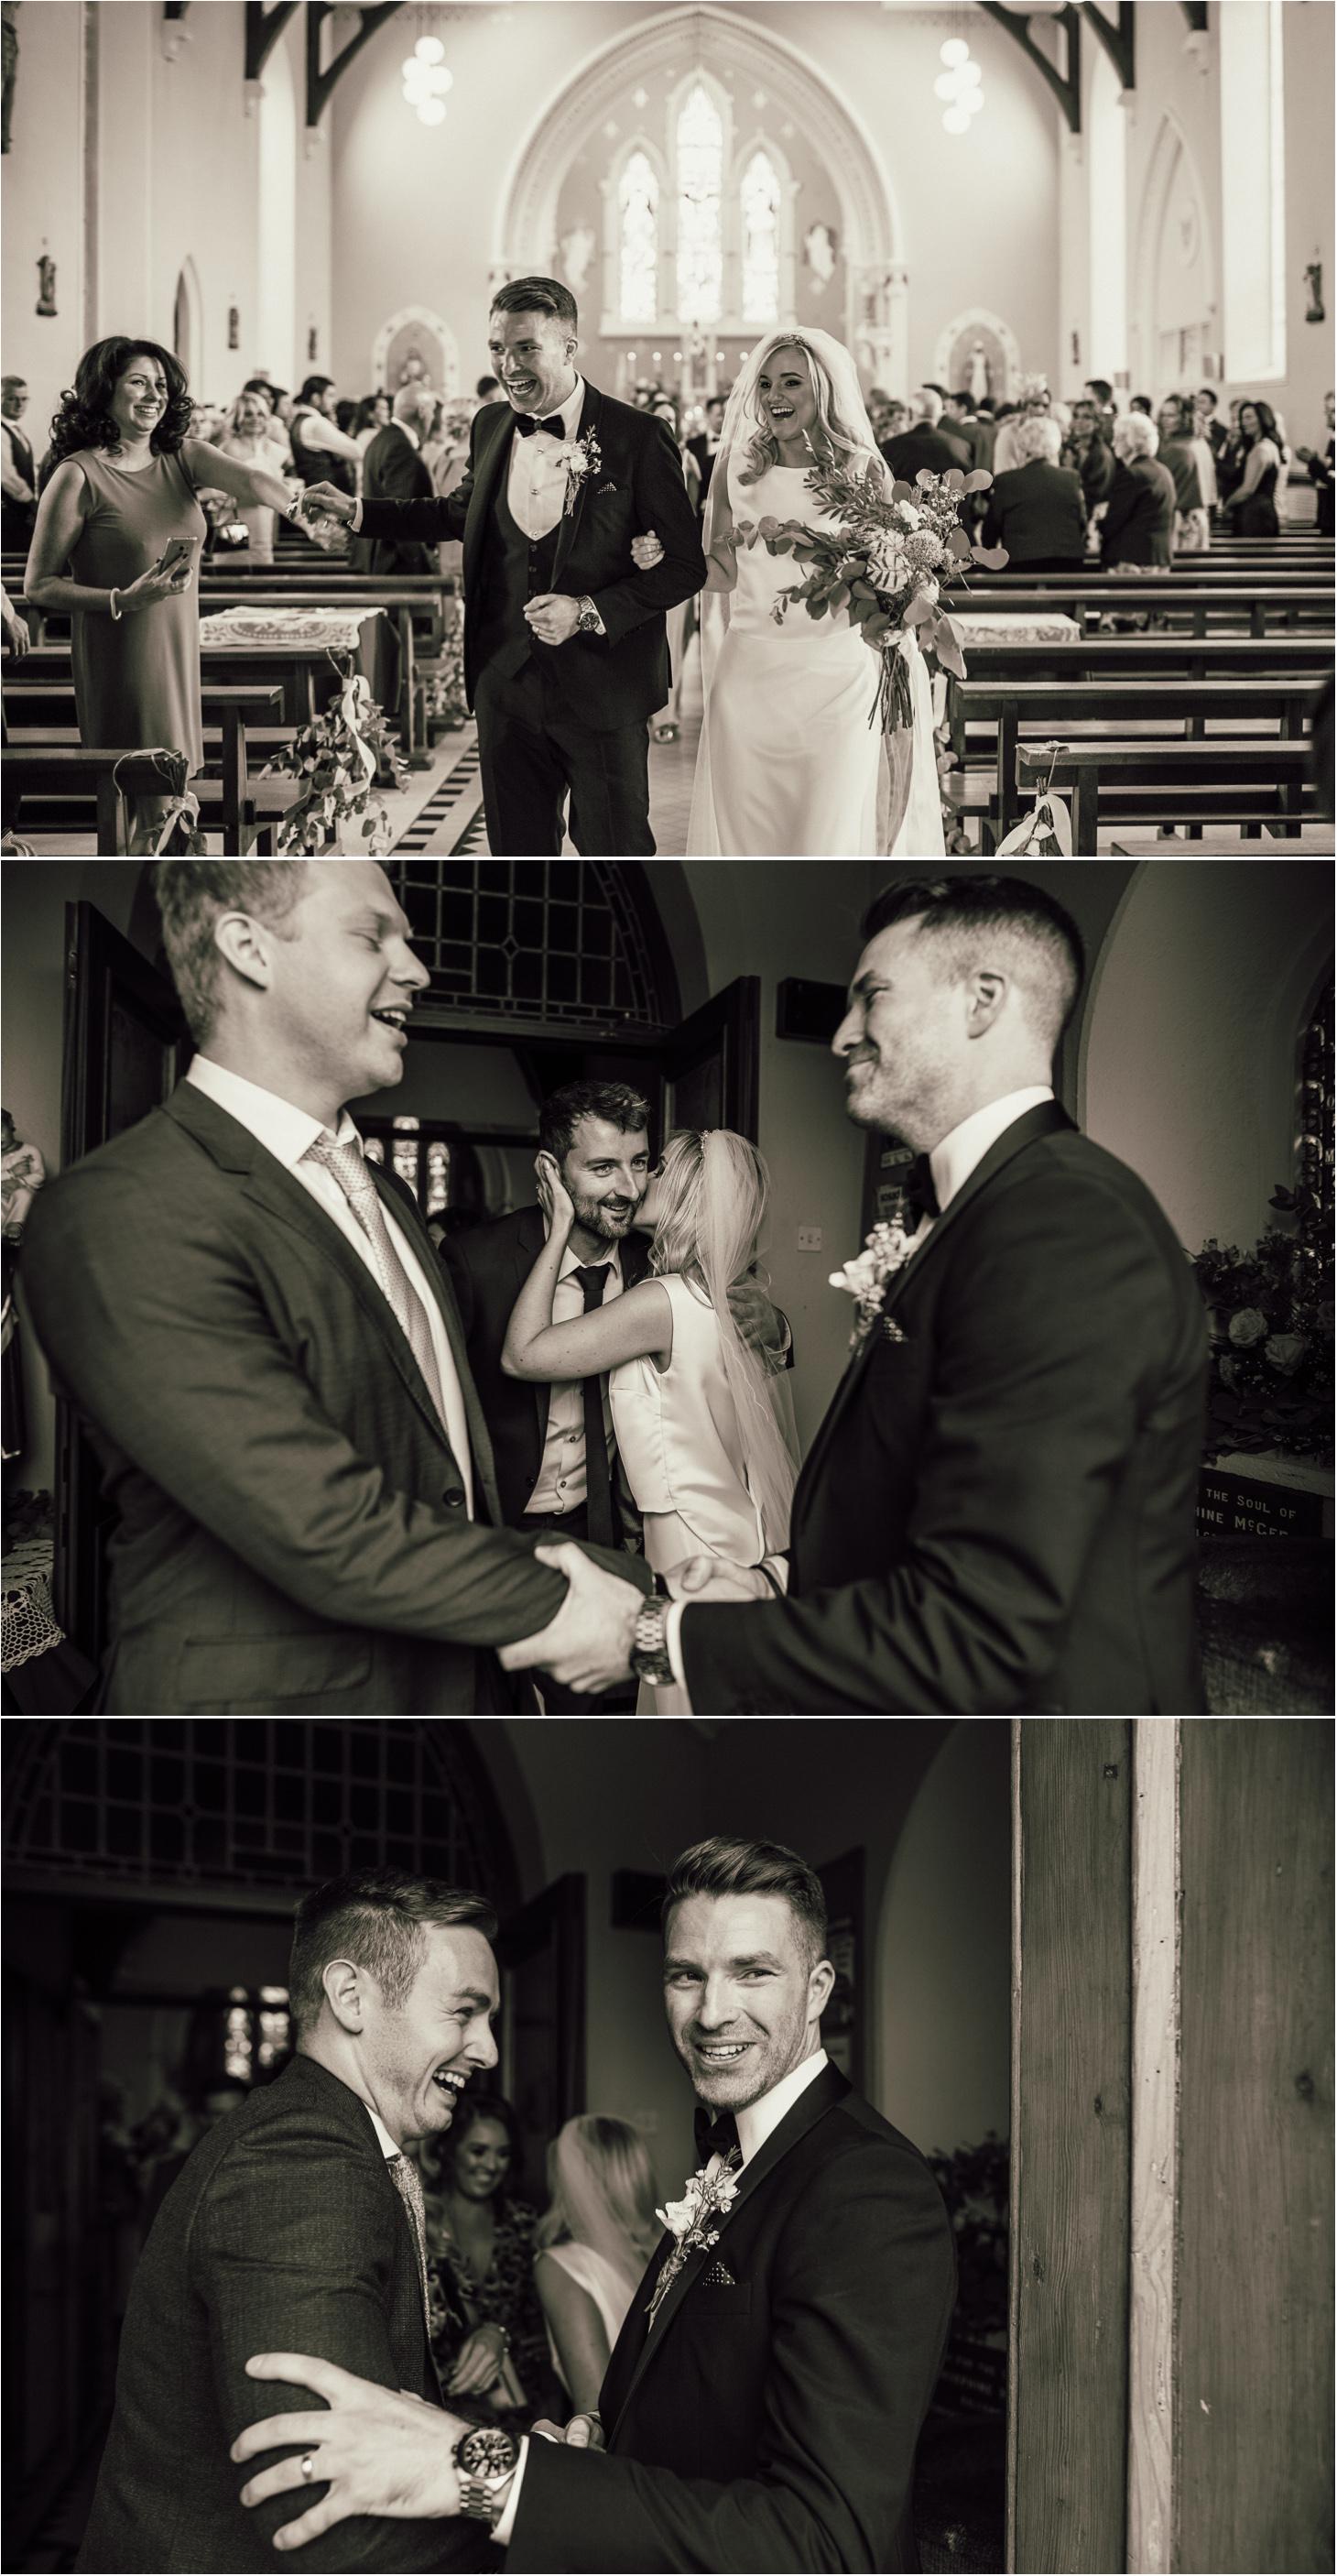 Virgina Lodge Photography. darren fitzpatrick. Wedding.11